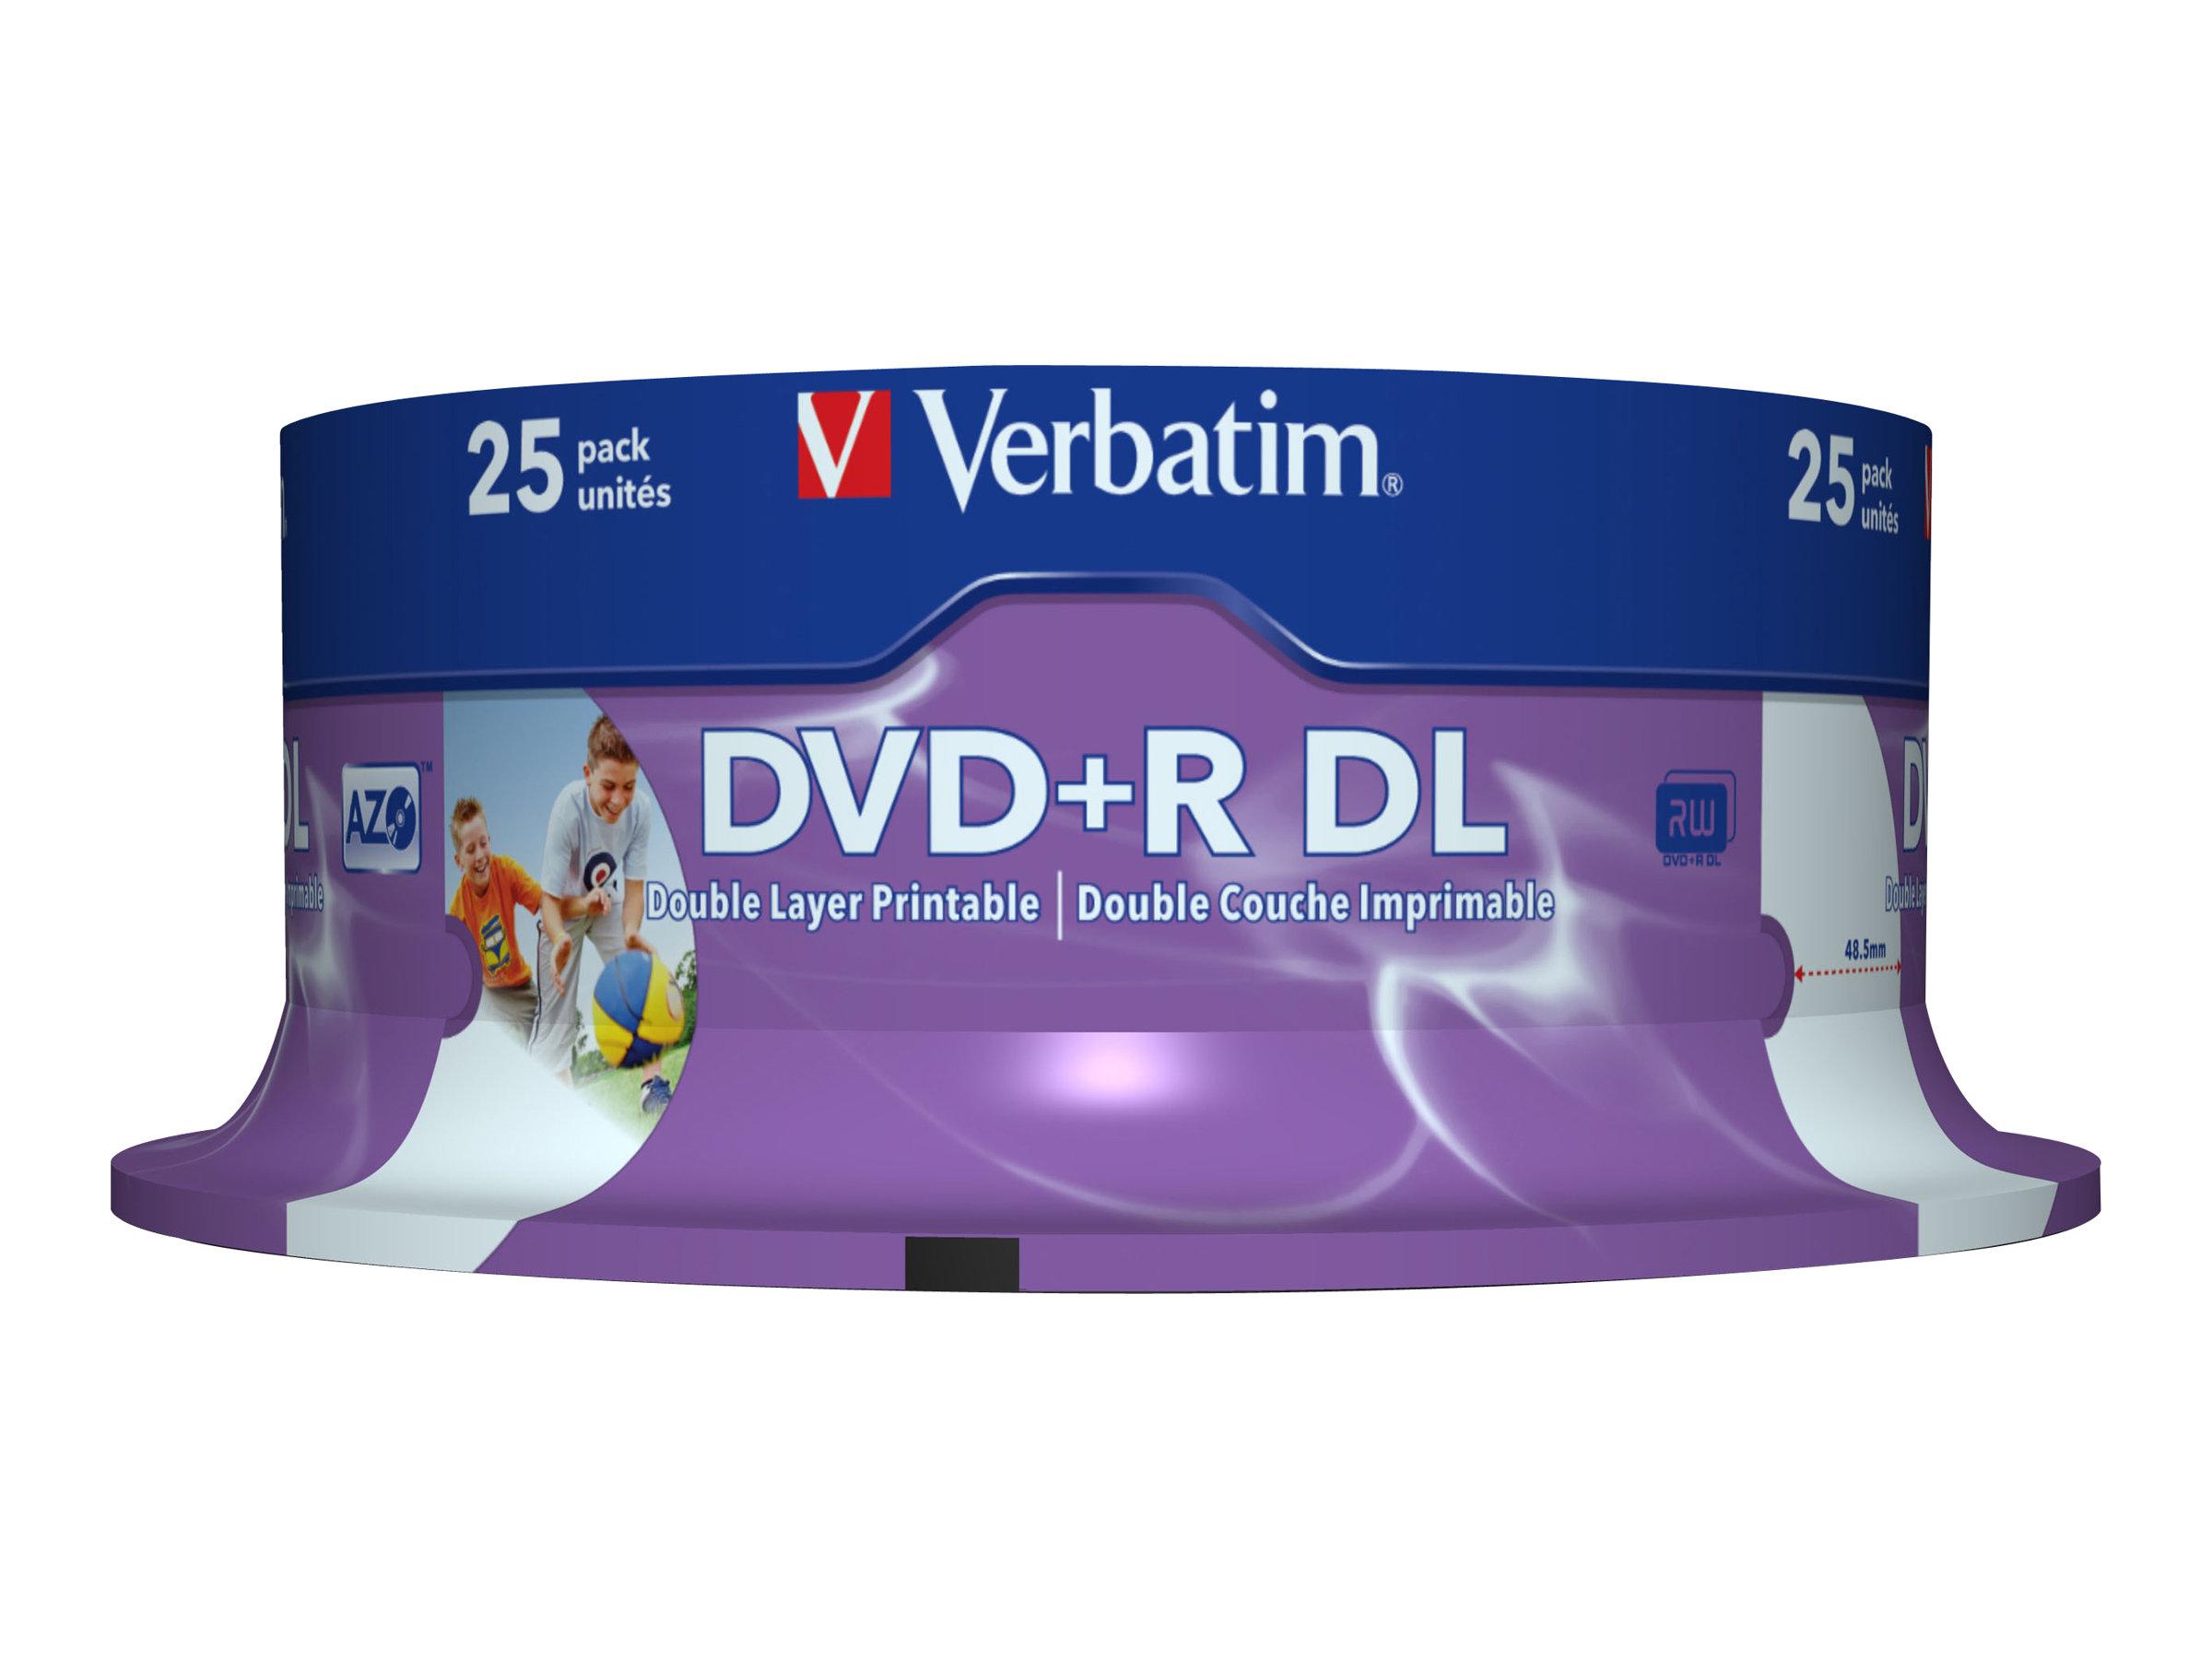 Verbatim DVD+R Double Layer Inkjet Printable 8x 8.5GB DVD+R DL 25Stück(e) 43667